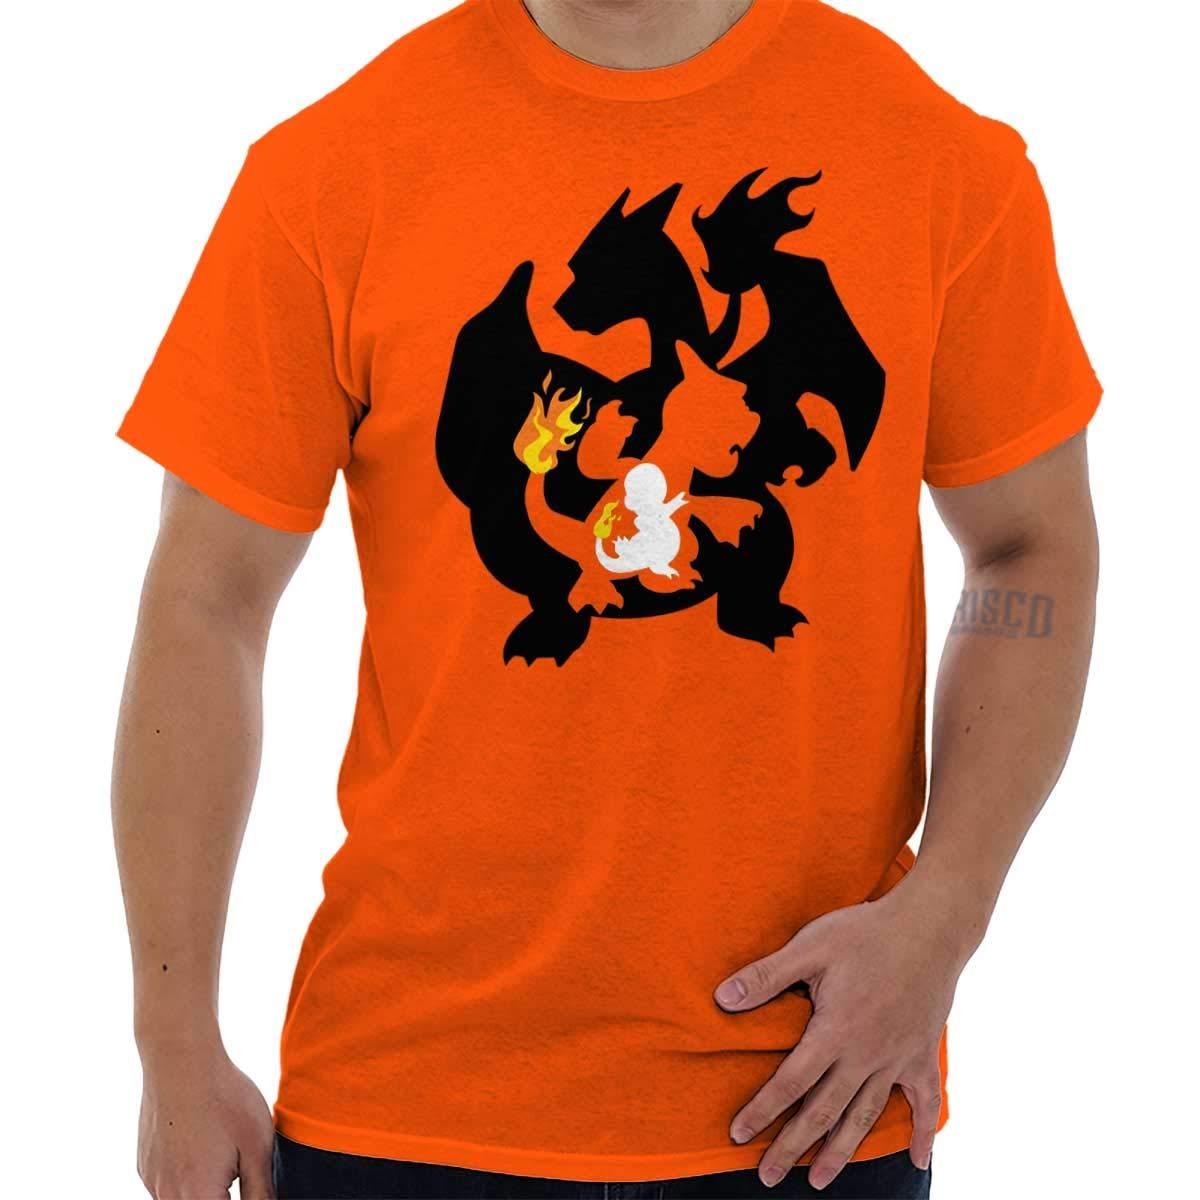 Brisco Brands Poke Go Evolution Gamer Nerd Cool Workout T Shirt Tee